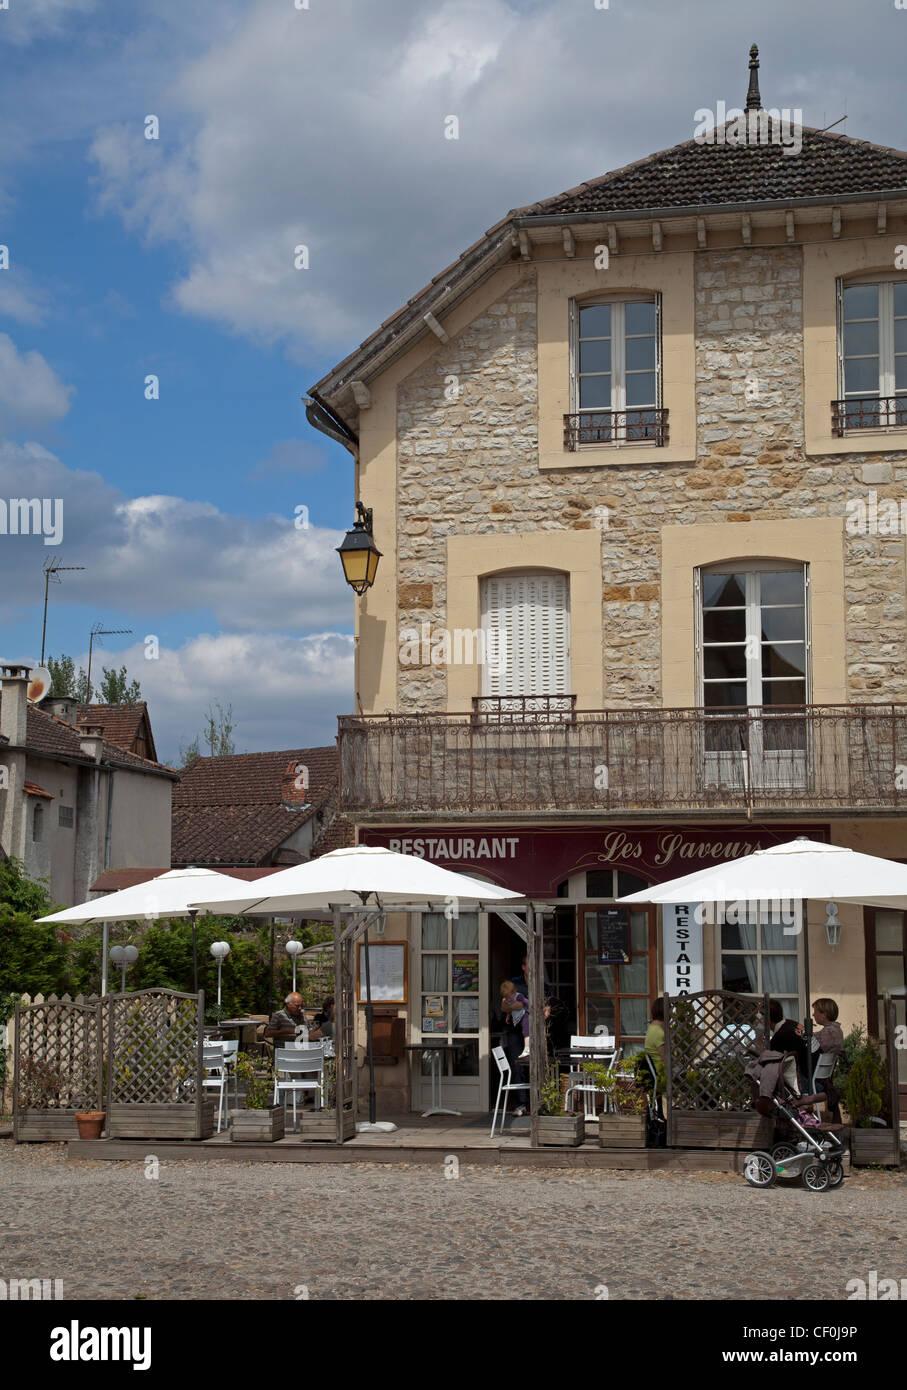 Restaurant Les Saveurs at Bretenoux Stock Photo